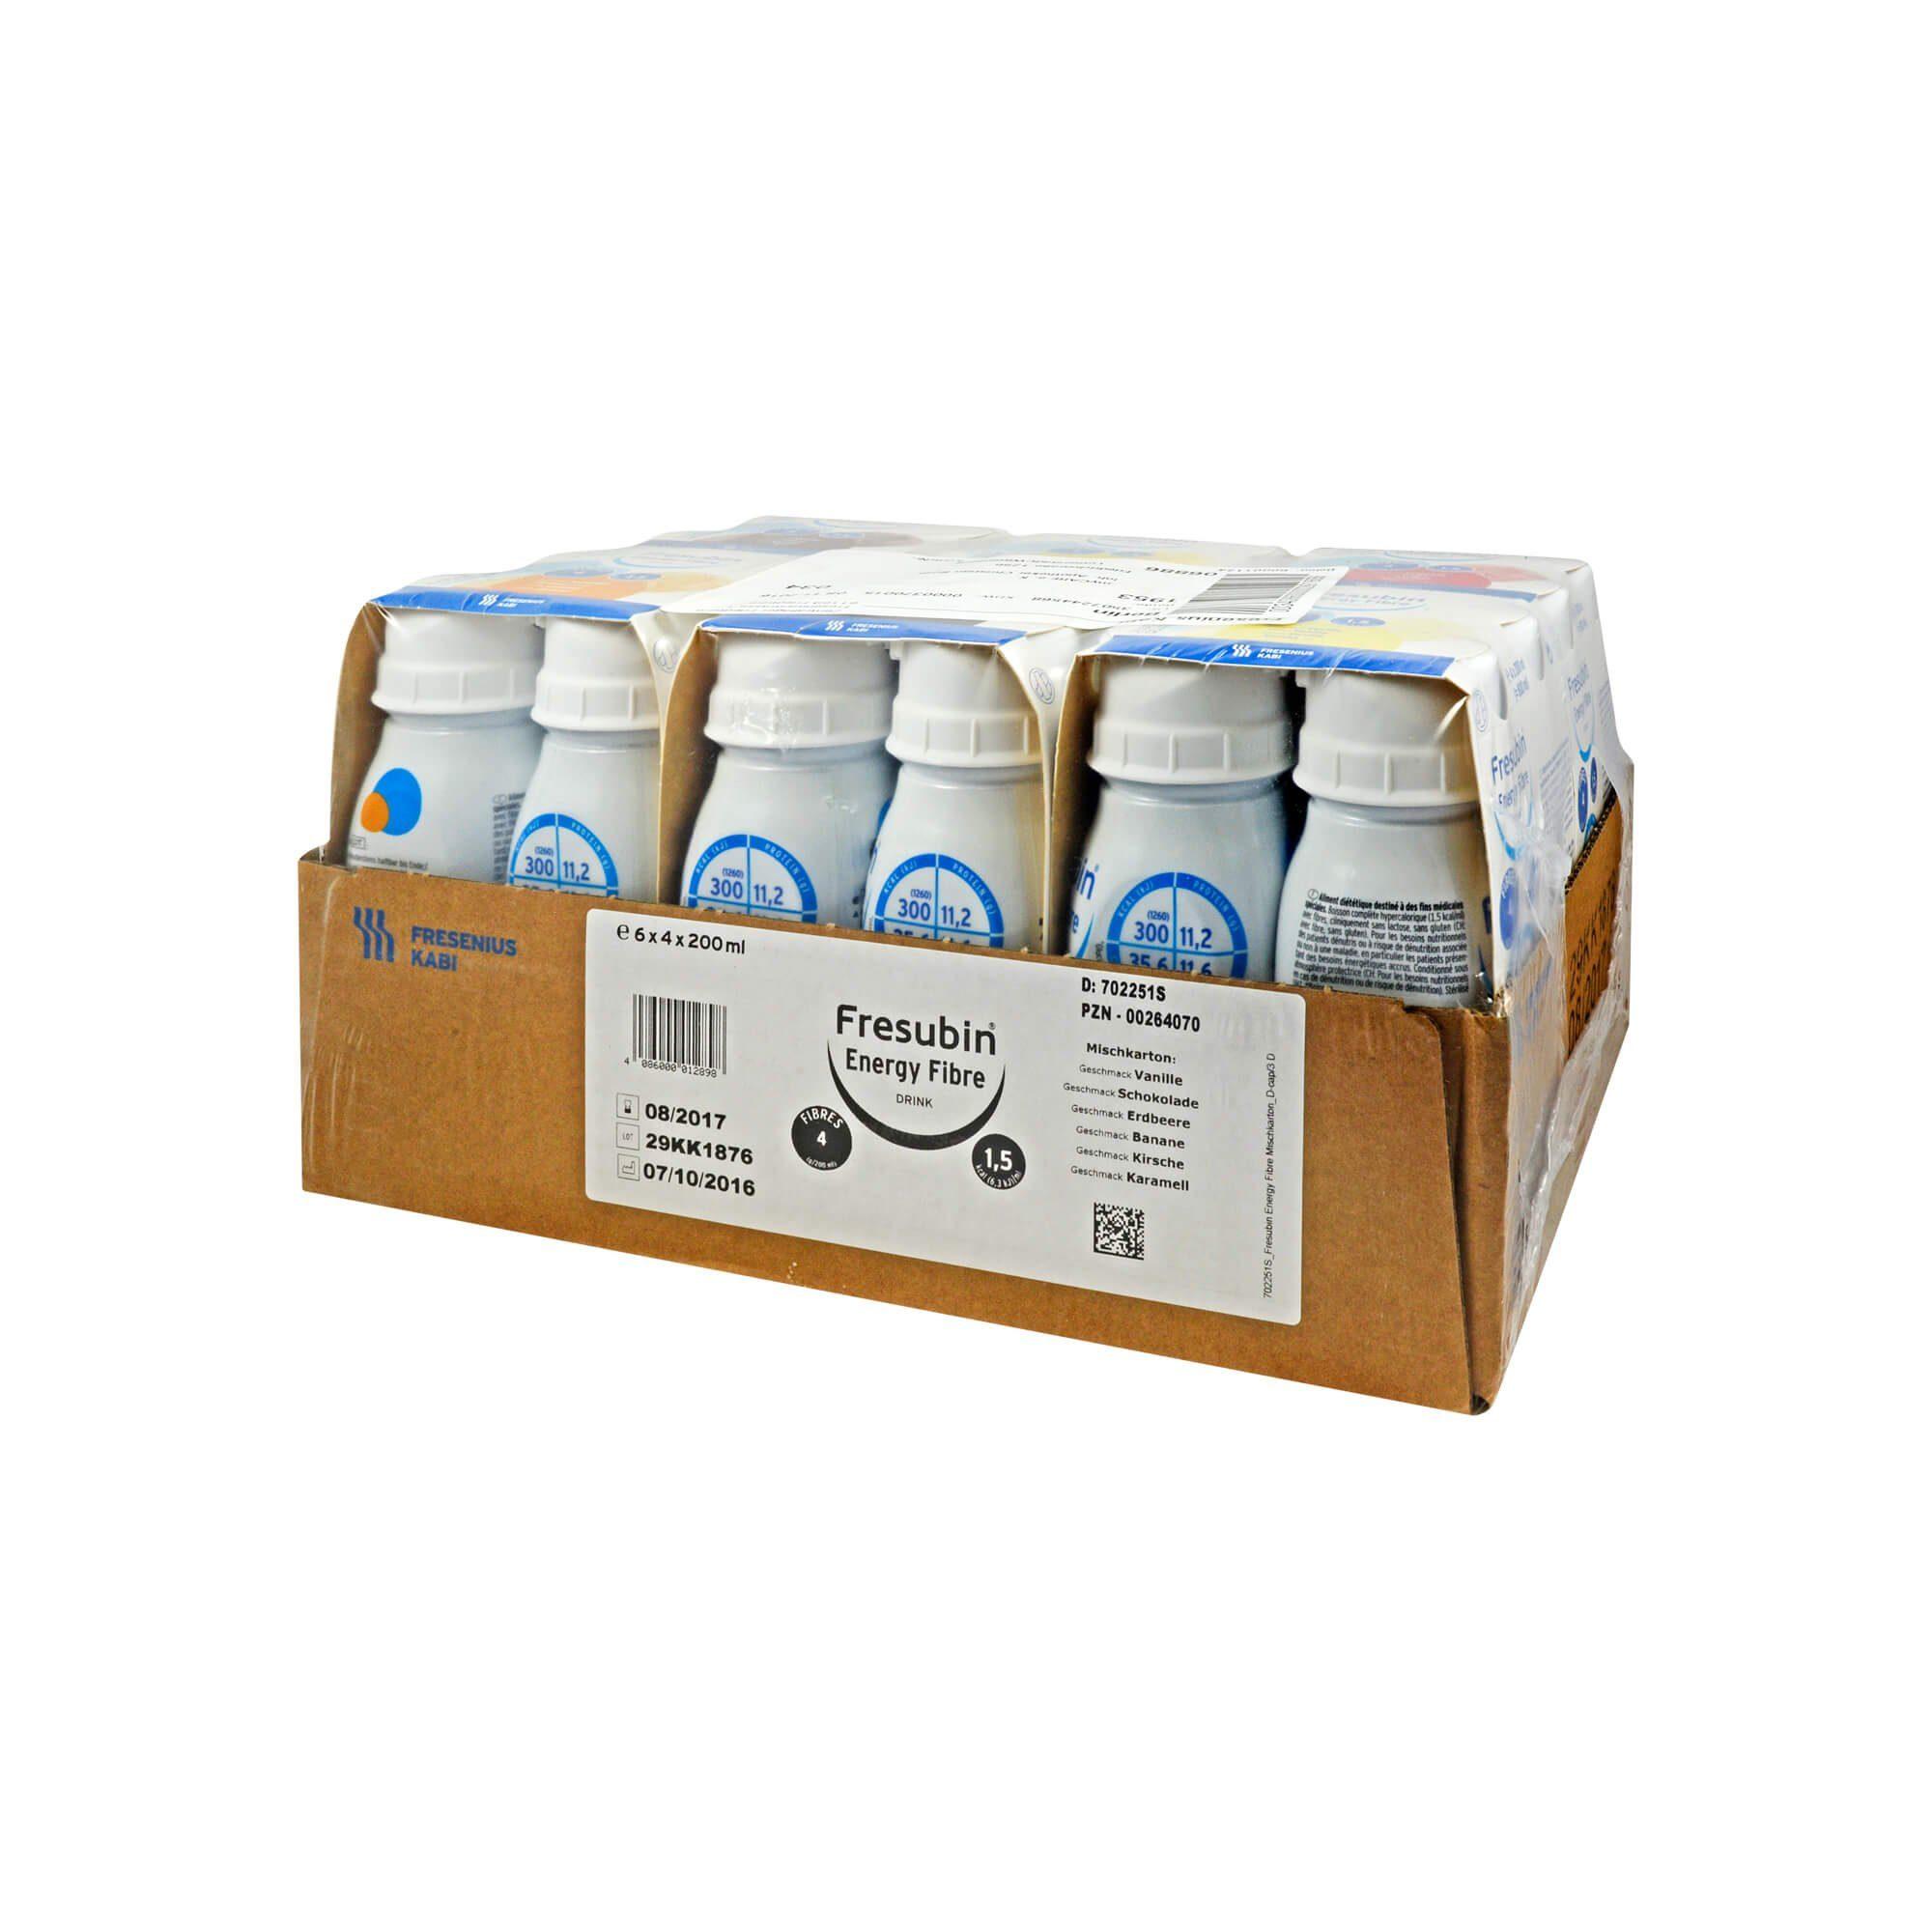 Fresubin ENERGY Fibre Drink Mischkarton Trinkflasche, 6X4X200 ml